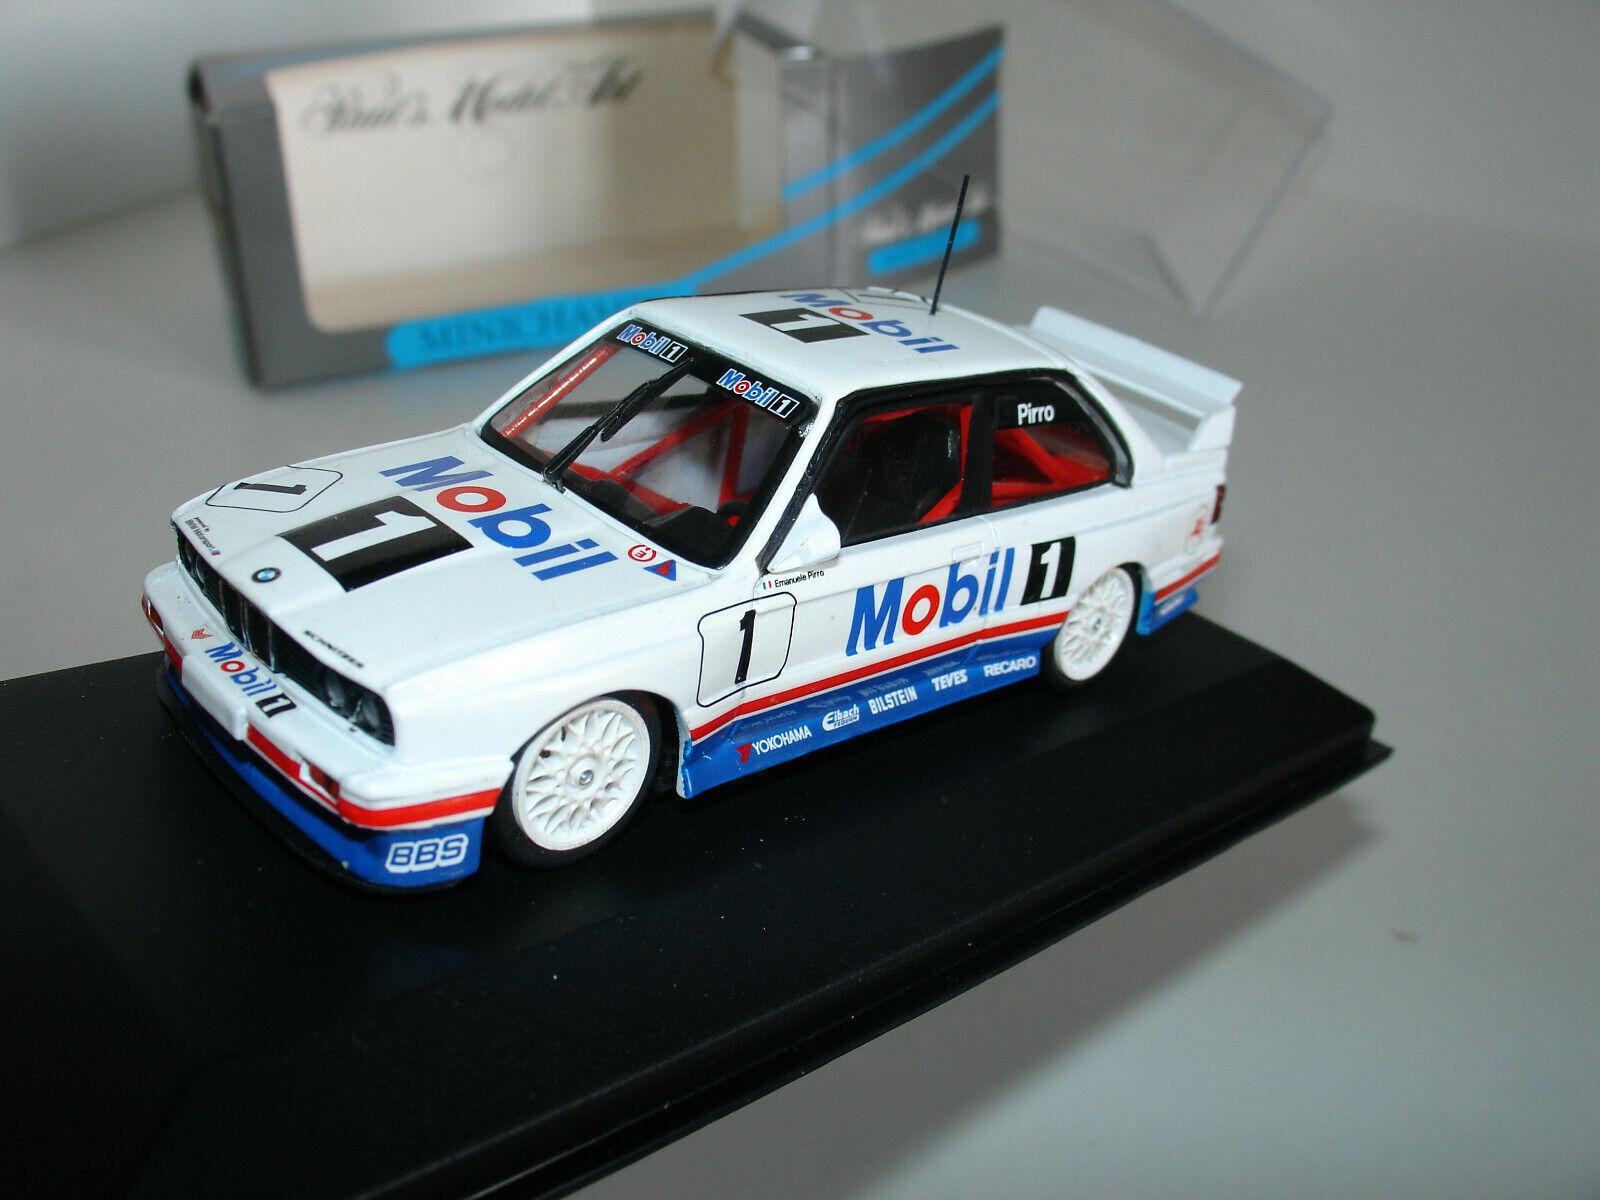 1 43 BMW M3 DTM  1 GP MACAU 1992  MOBIL 1  E. PIRRO MIN 22004 by MINICHAMPS